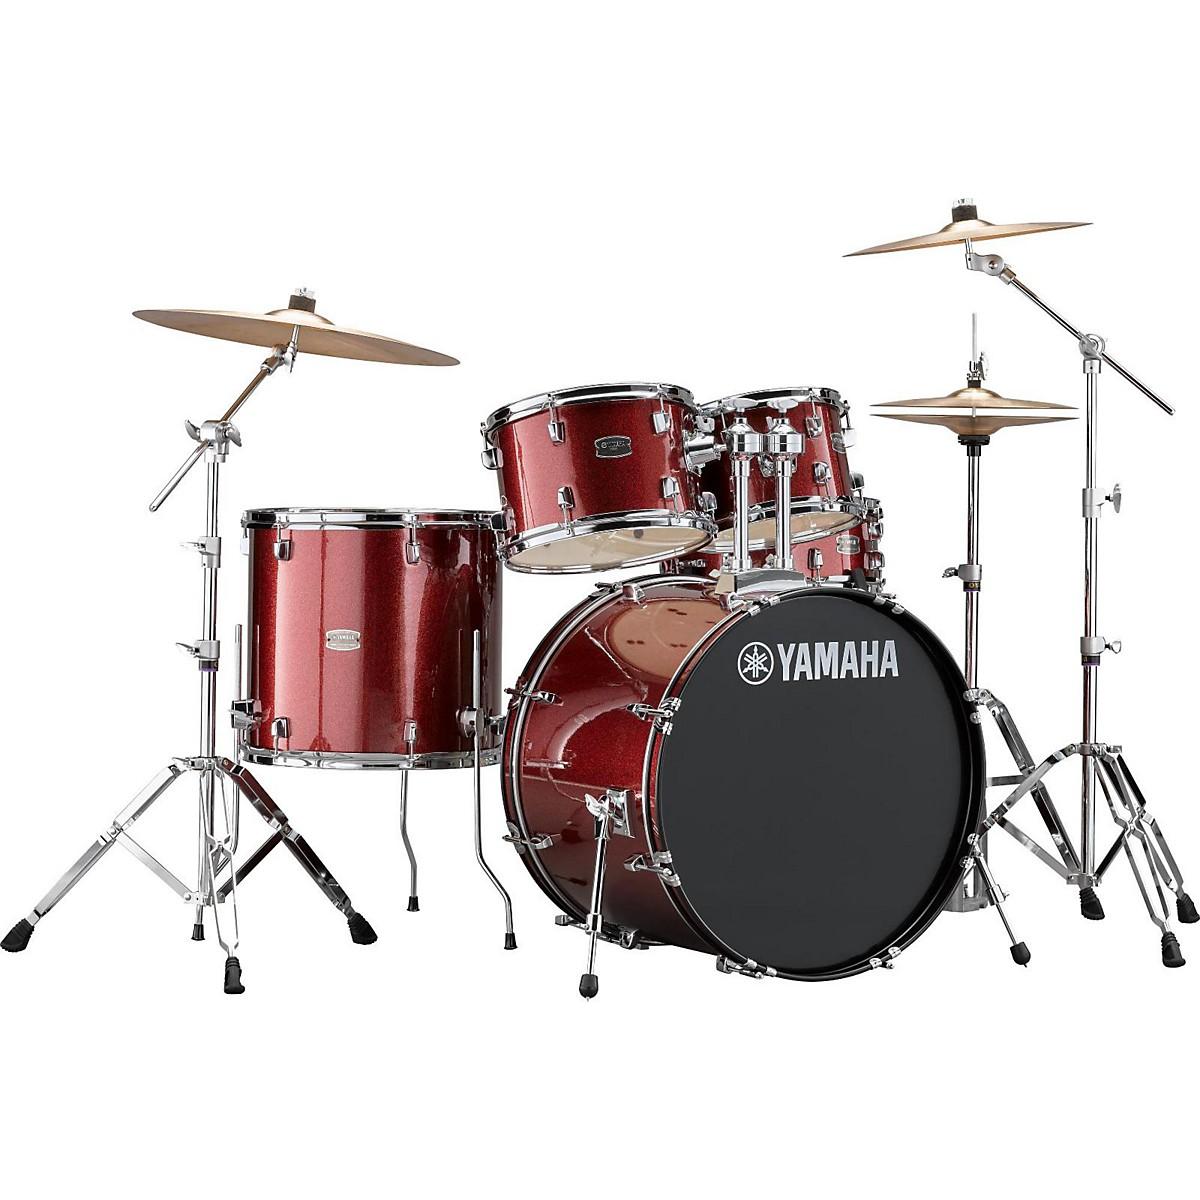 Yamaha Rydeen 5-Piece Shell Pack with 22 in. Bass Drum